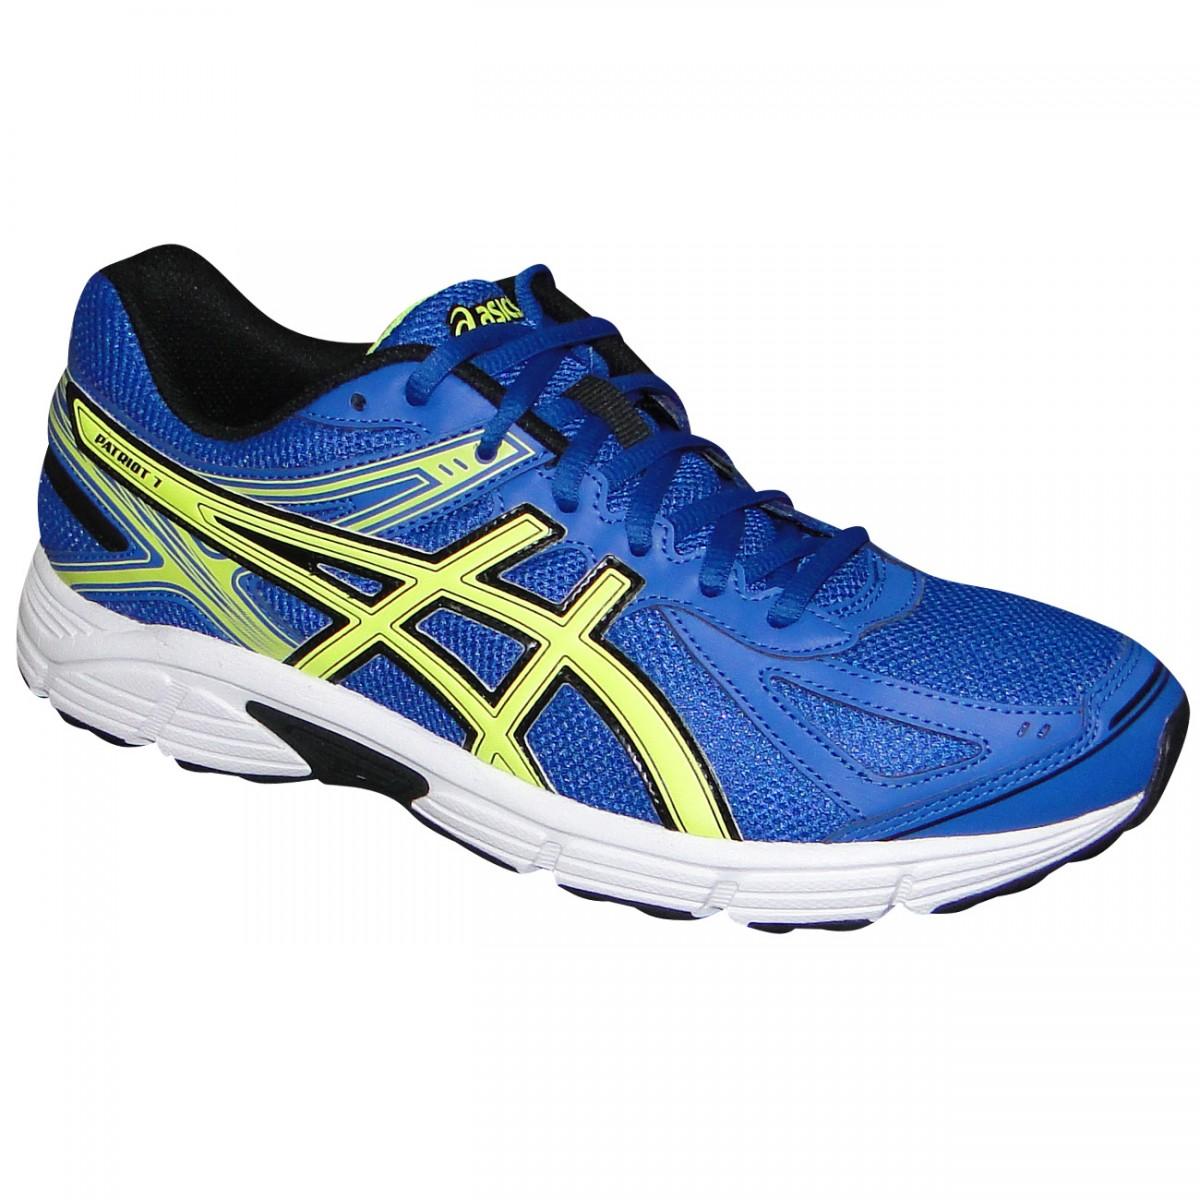 size 40 8963b 3d0b9 Tenis Asics Patriot 7 T4D1N 4207 - Azul Limão Branco - Chuteira Nike,  Adidas. Sandalias Femininas. Sandy Calçados